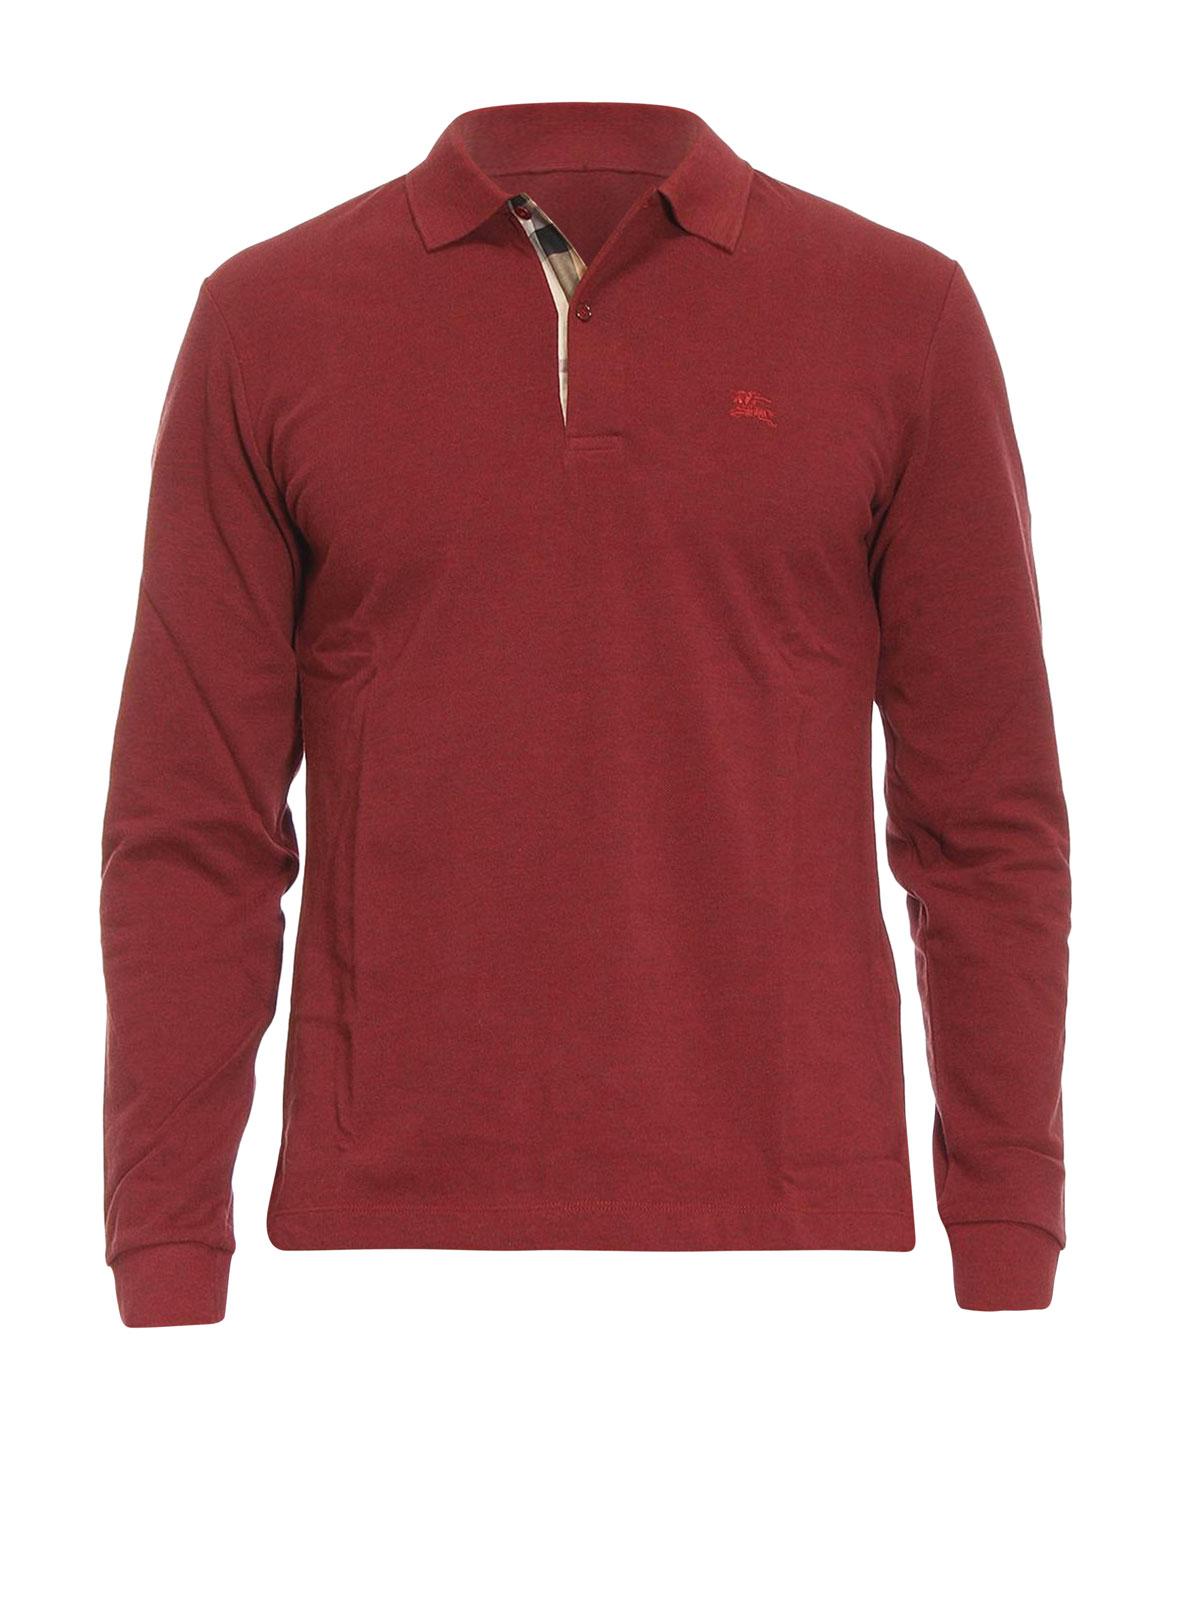 Check Detail Pique Cotton Polo By Burberry Polo Shirts